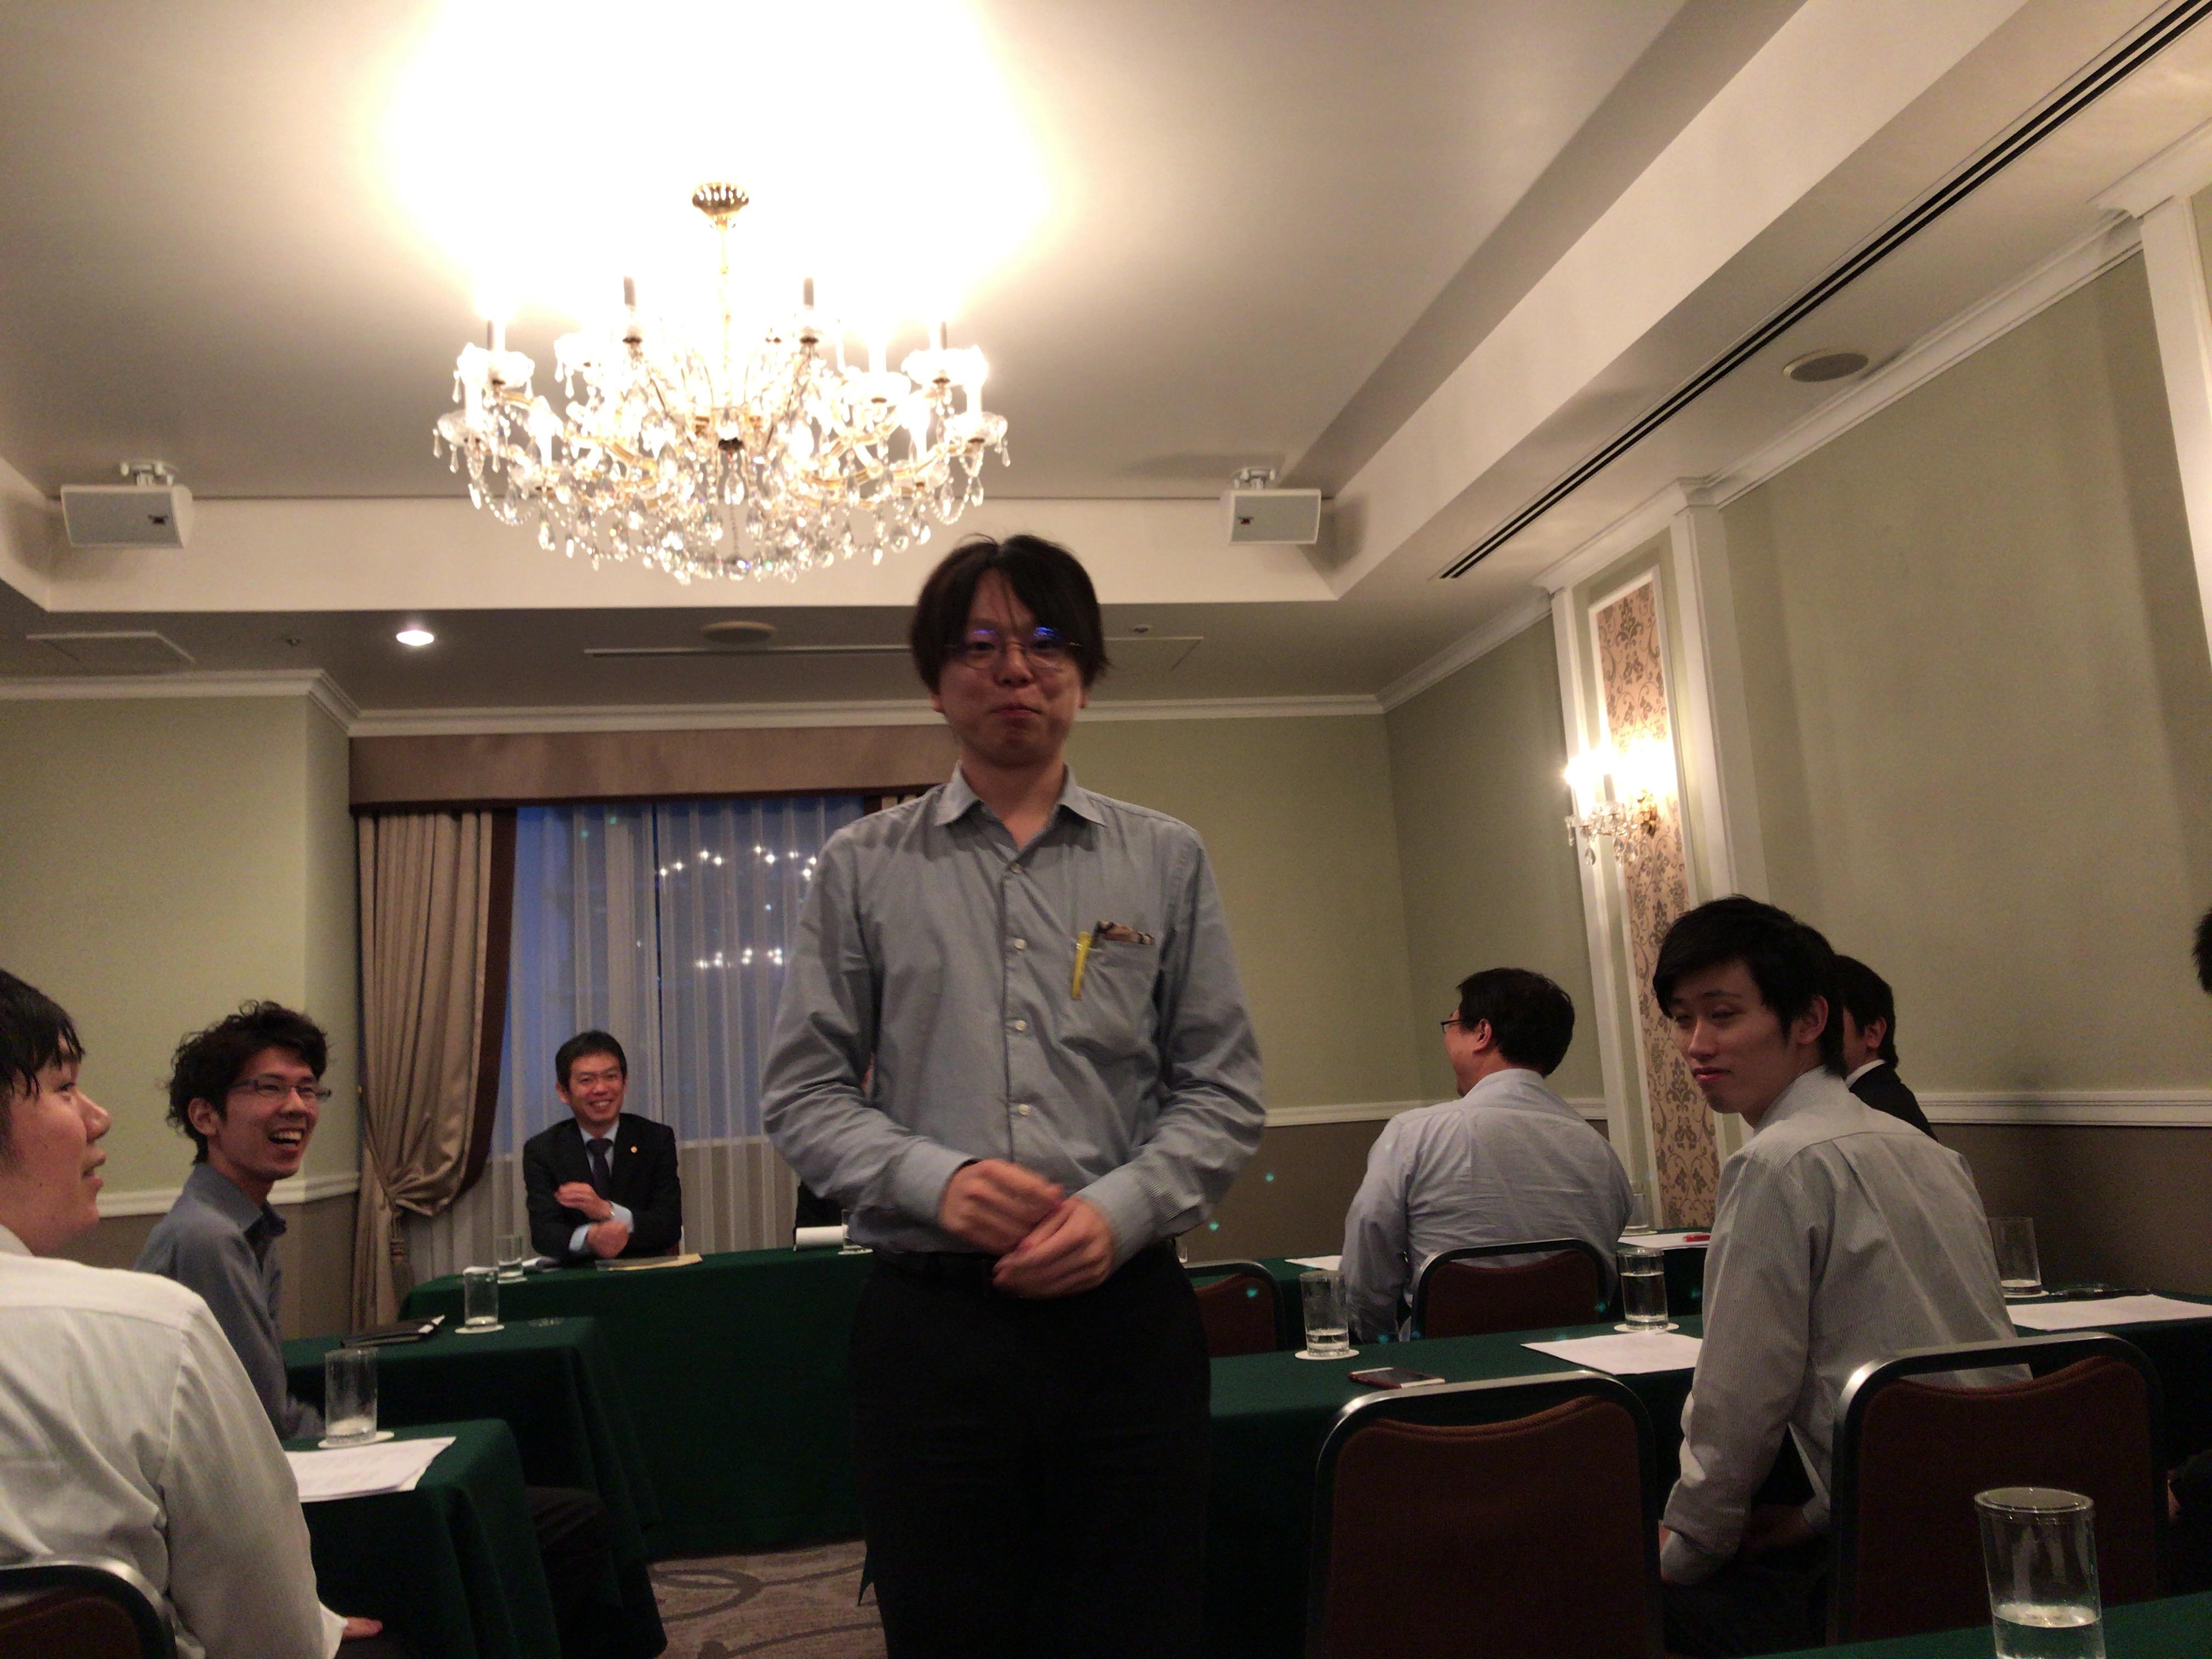 SE・PG7月1日採用、新入社員の紹介